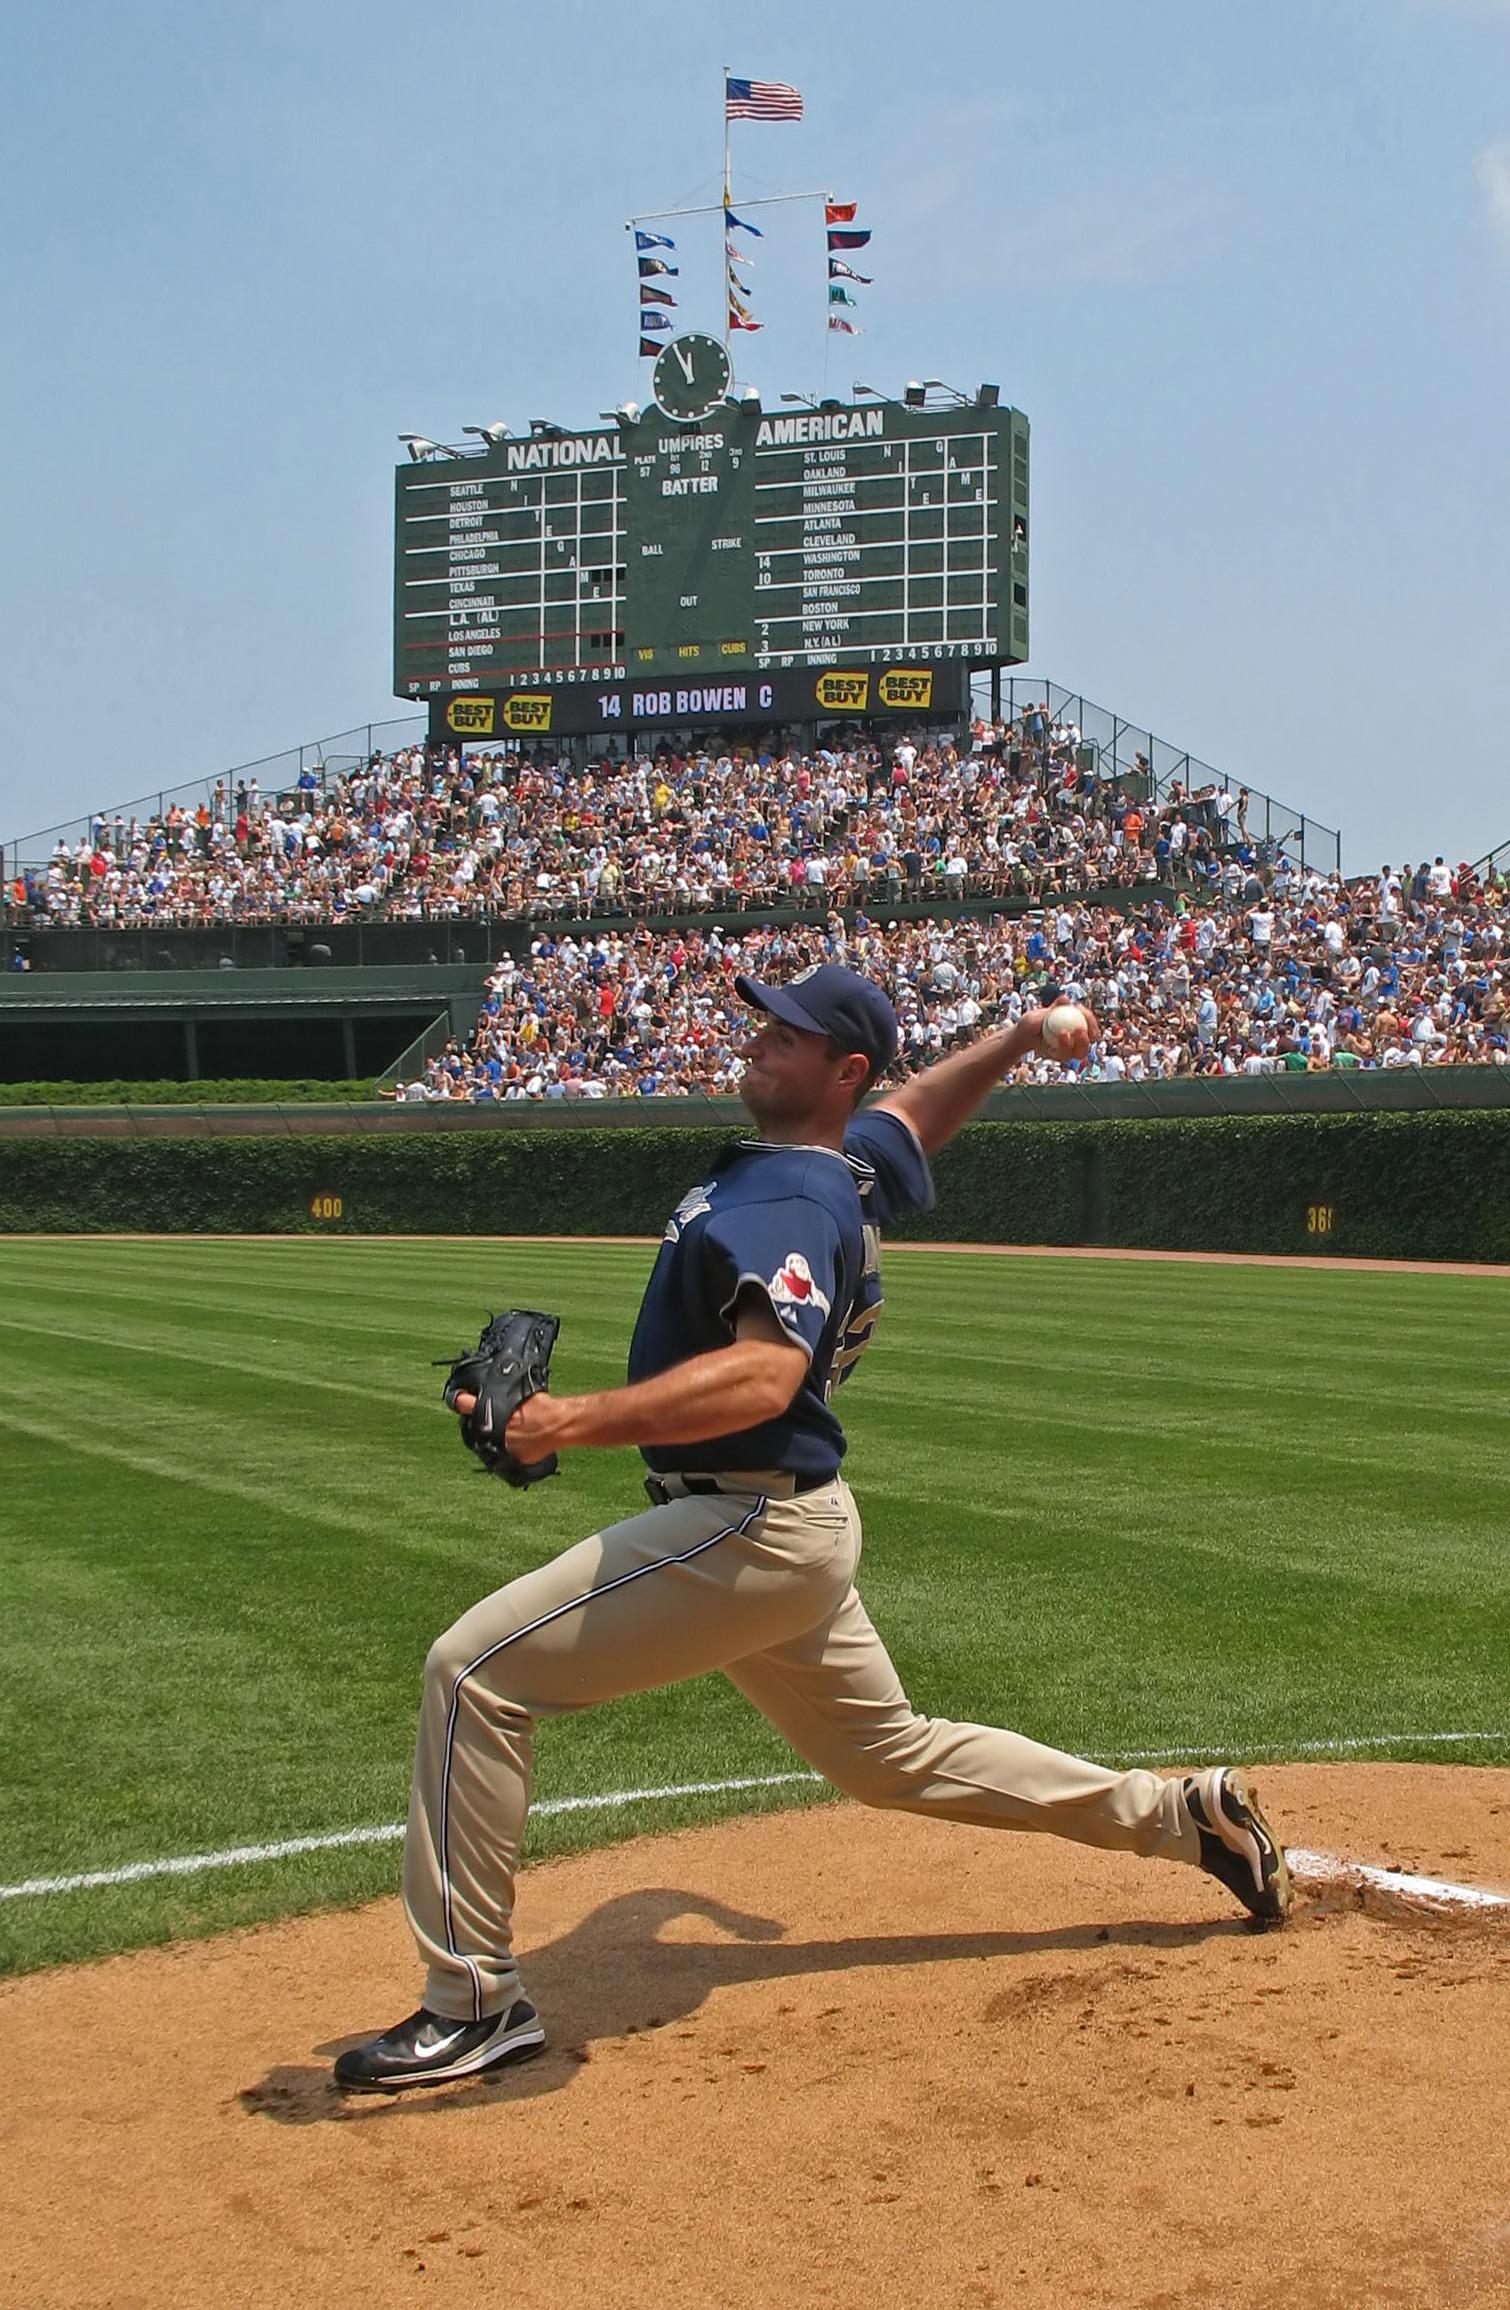 Pitcher Adalah : pitcher, adalah, Starting, Pitcher, Wikipedia